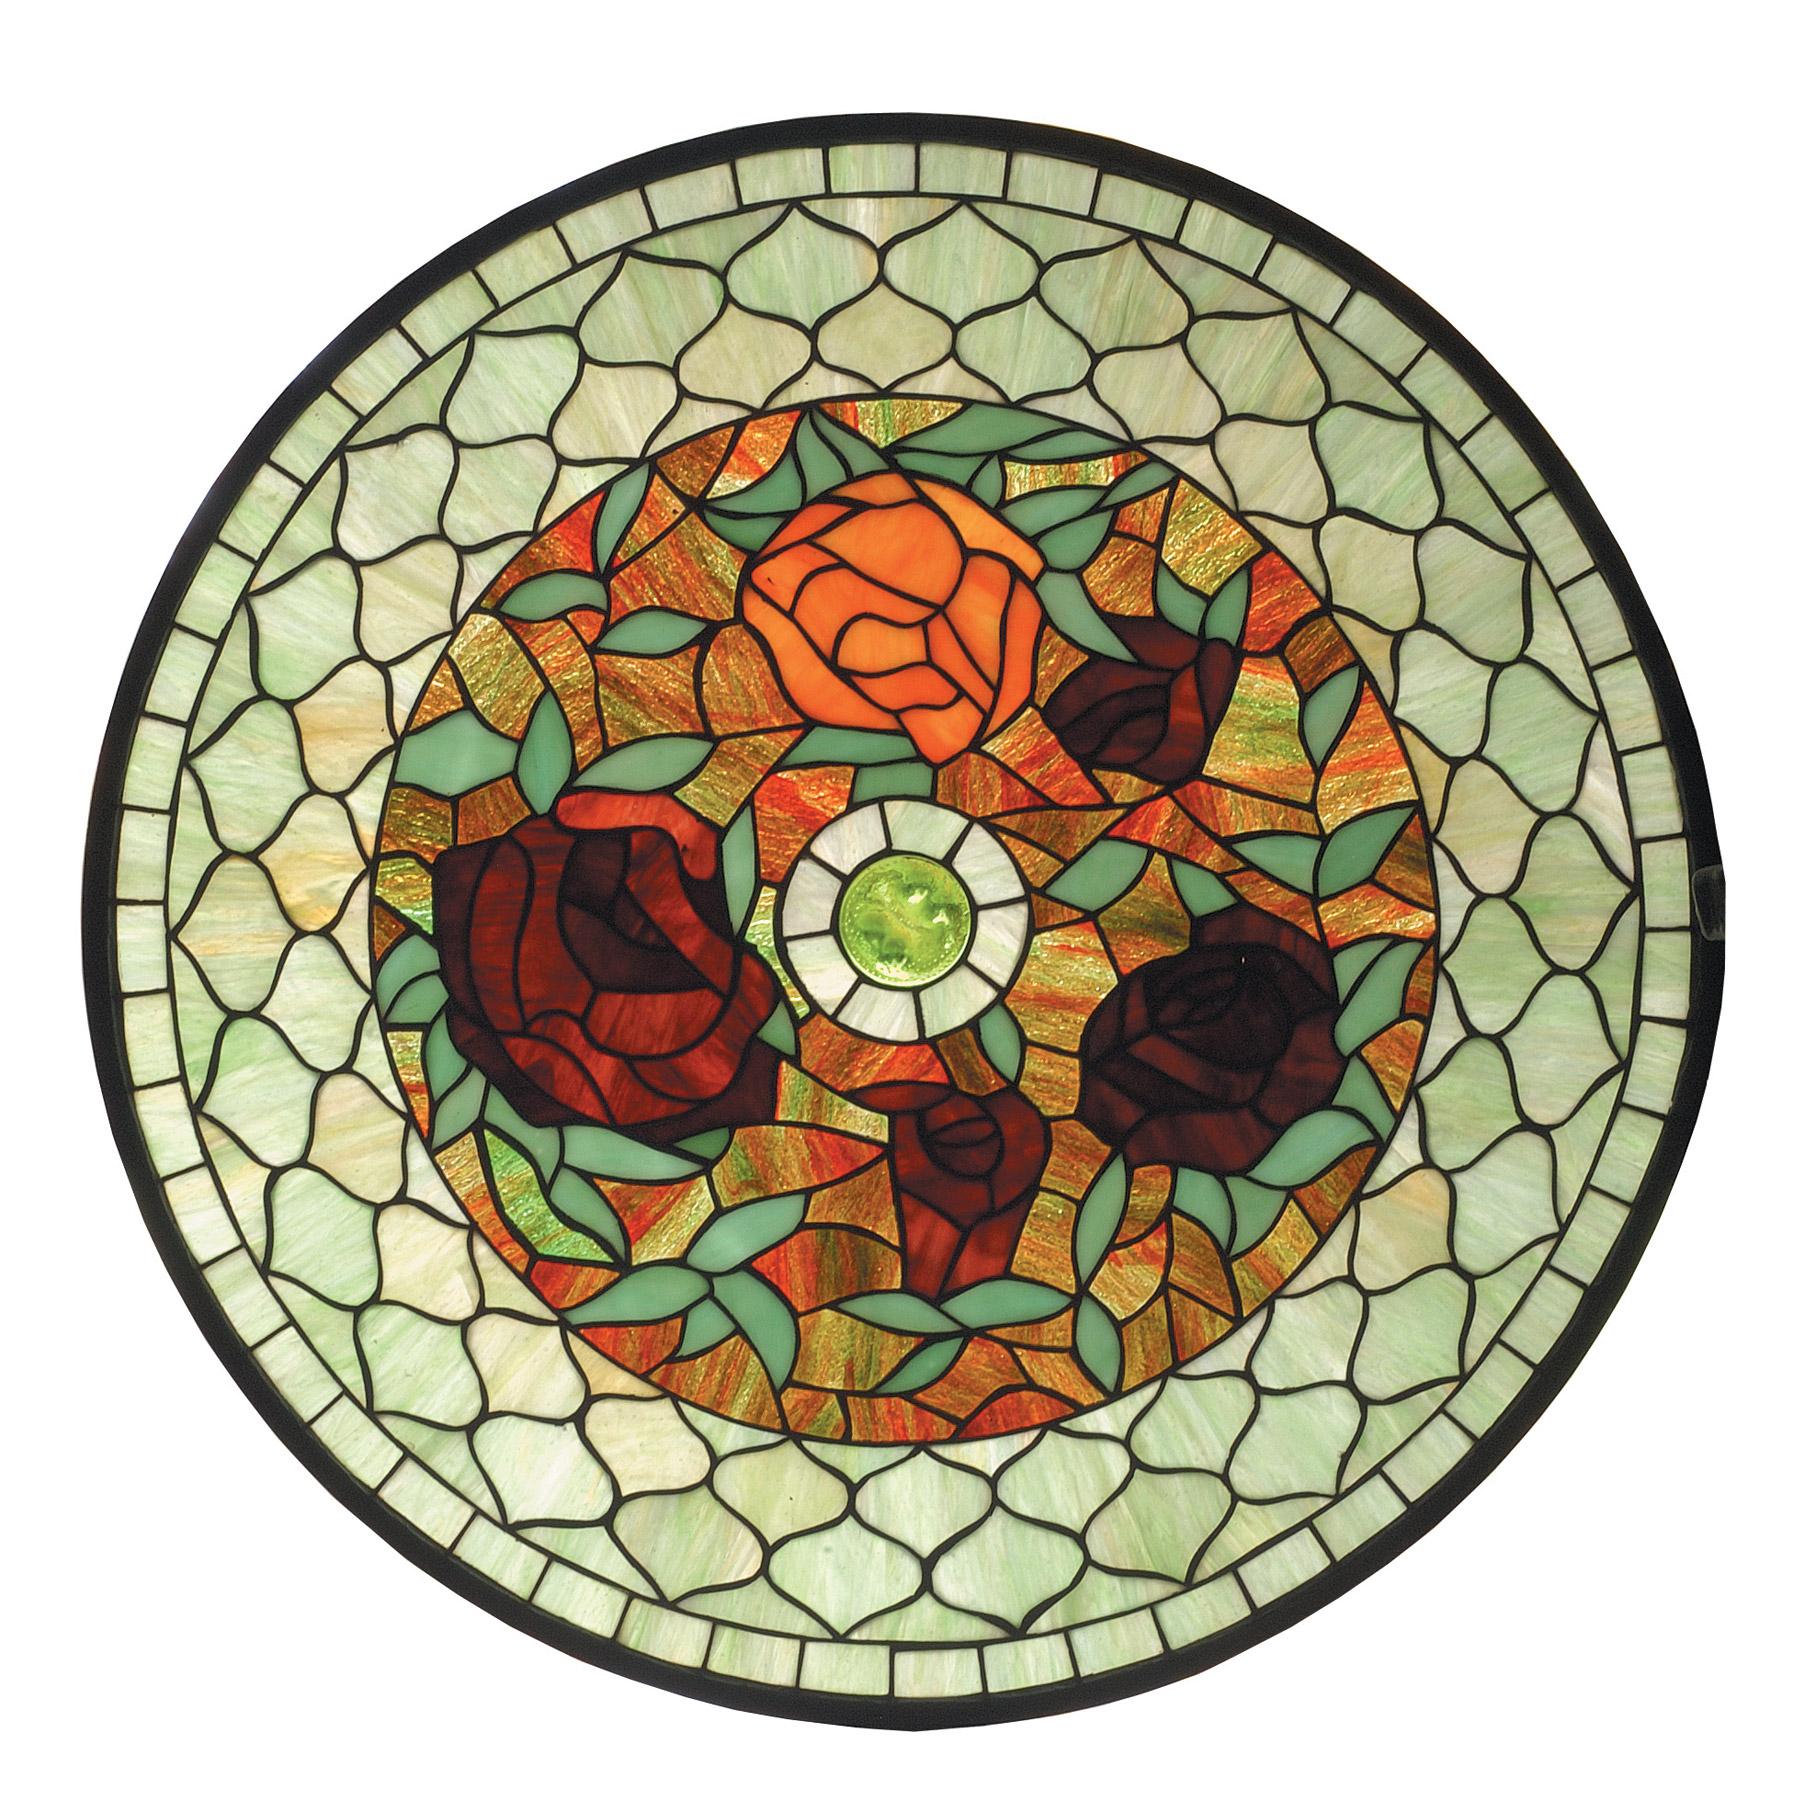 Meyda 73103 tiffany rosebush round stained glass window for Window design round